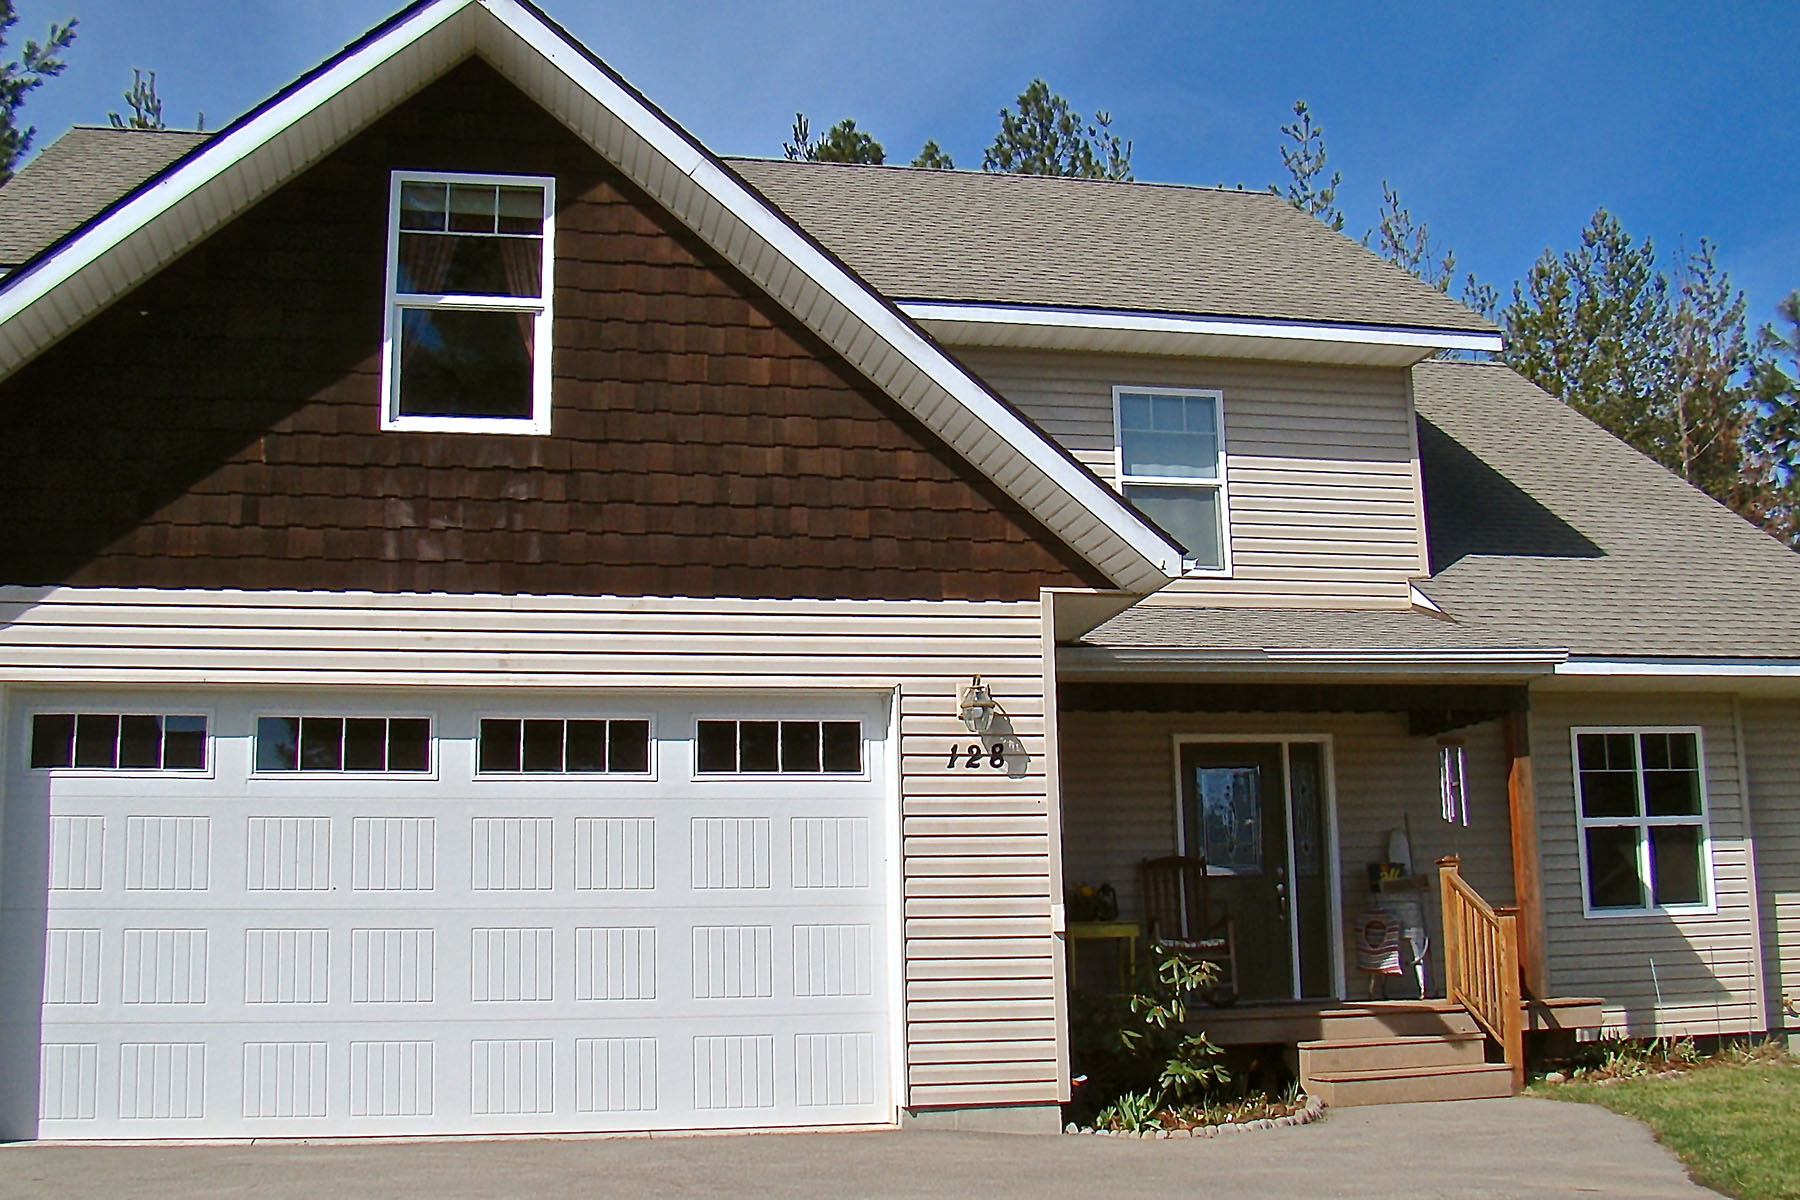 Tek Ailelik Ev için Satış at Spacious Comfortable Home Great Location! 128 Rebecca's Way Kootenai, Idaho, 83840 Amerika Birleşik Devletleri